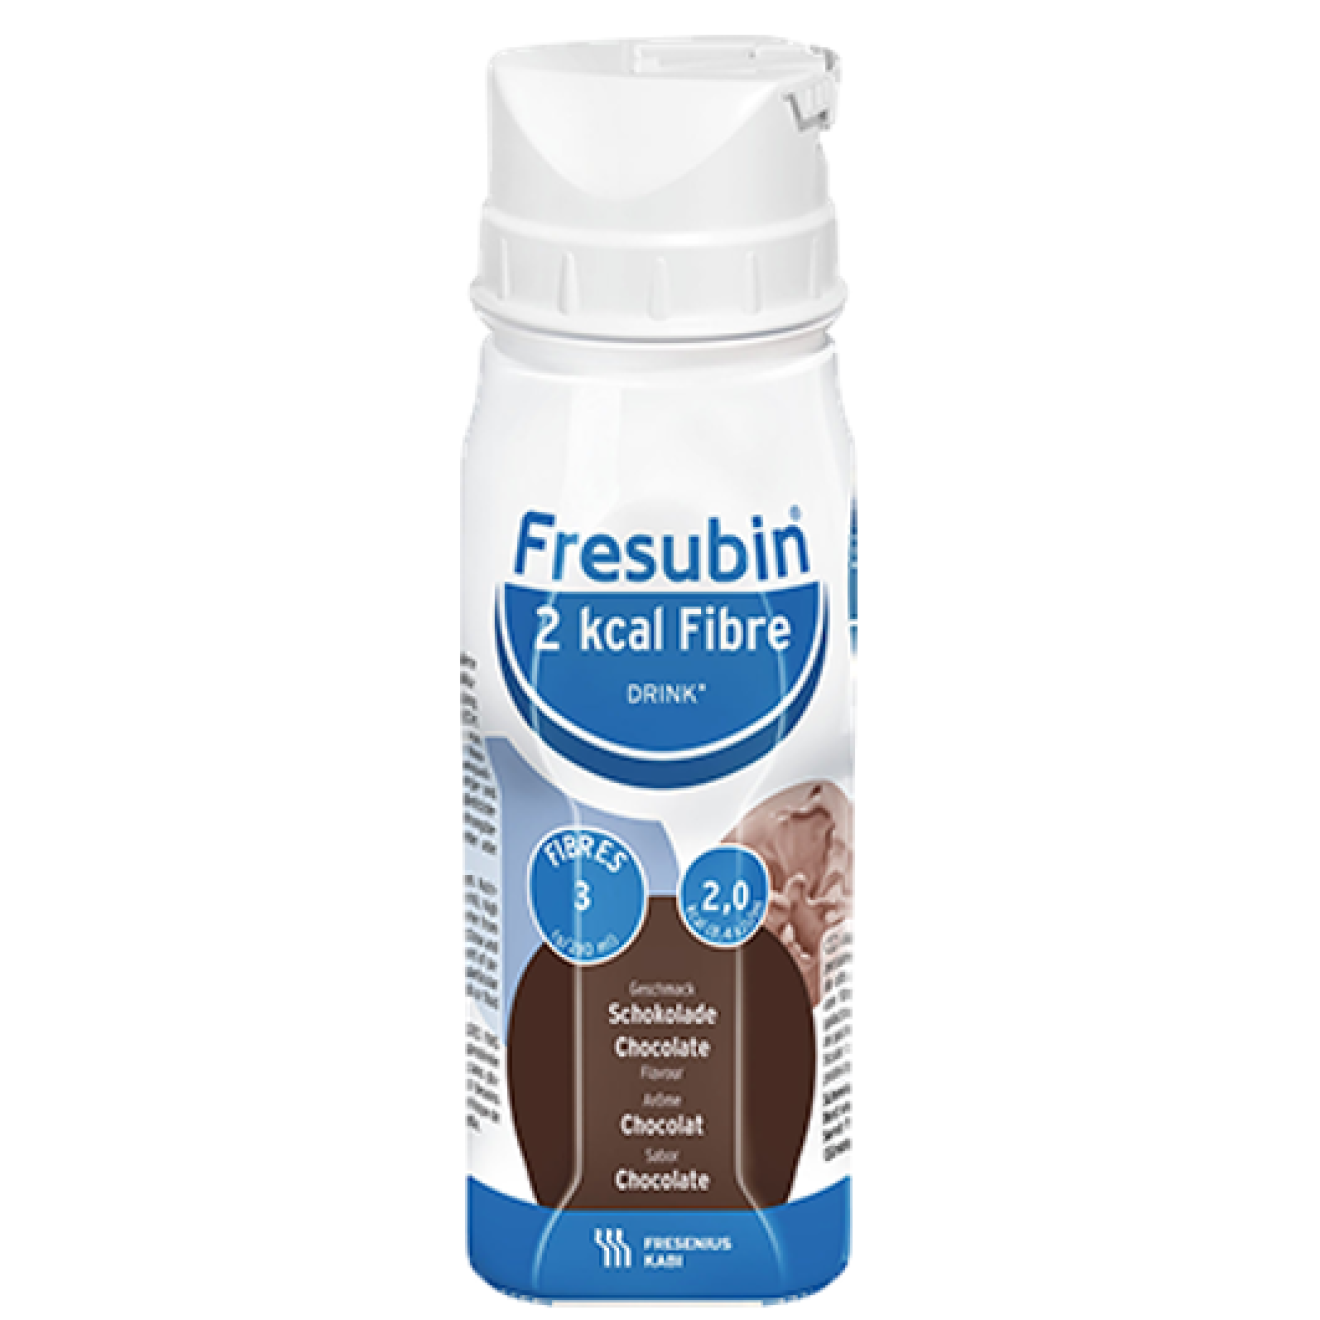 Fresubin 2 KCAL Fibre Drink Schokolade 4x200ml